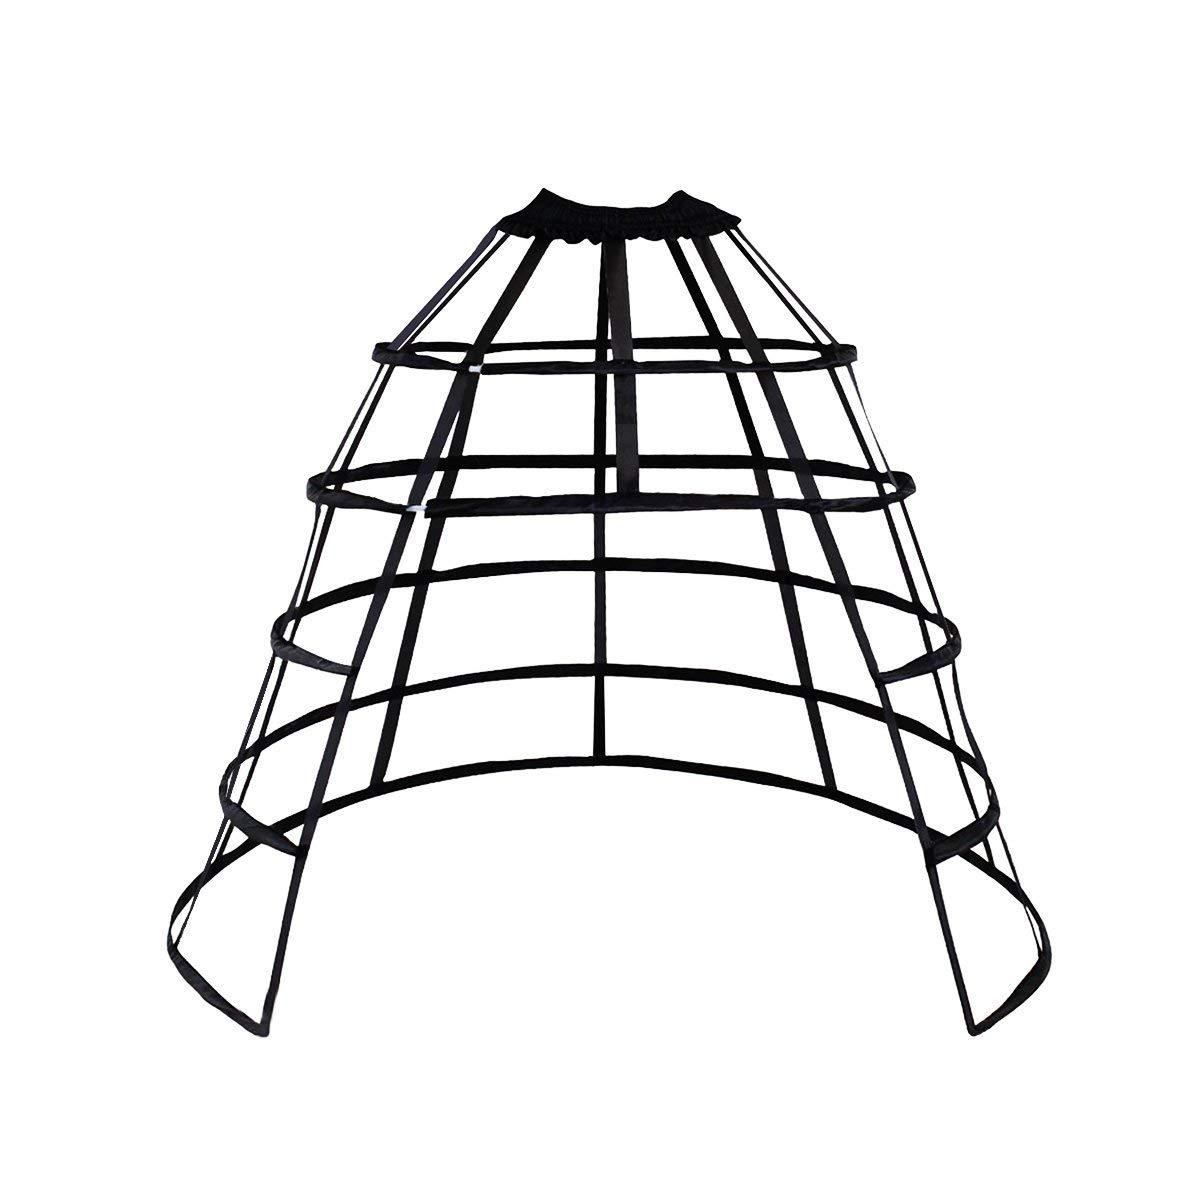 Victorian Lingerie History – Corset, Chemise, Petticoats HappyStory Cage Hoop Skirt Petticoat Dress Pannier 5 Hoops Bustle Cage Crinoline $29.99 AT vintagedancer.com